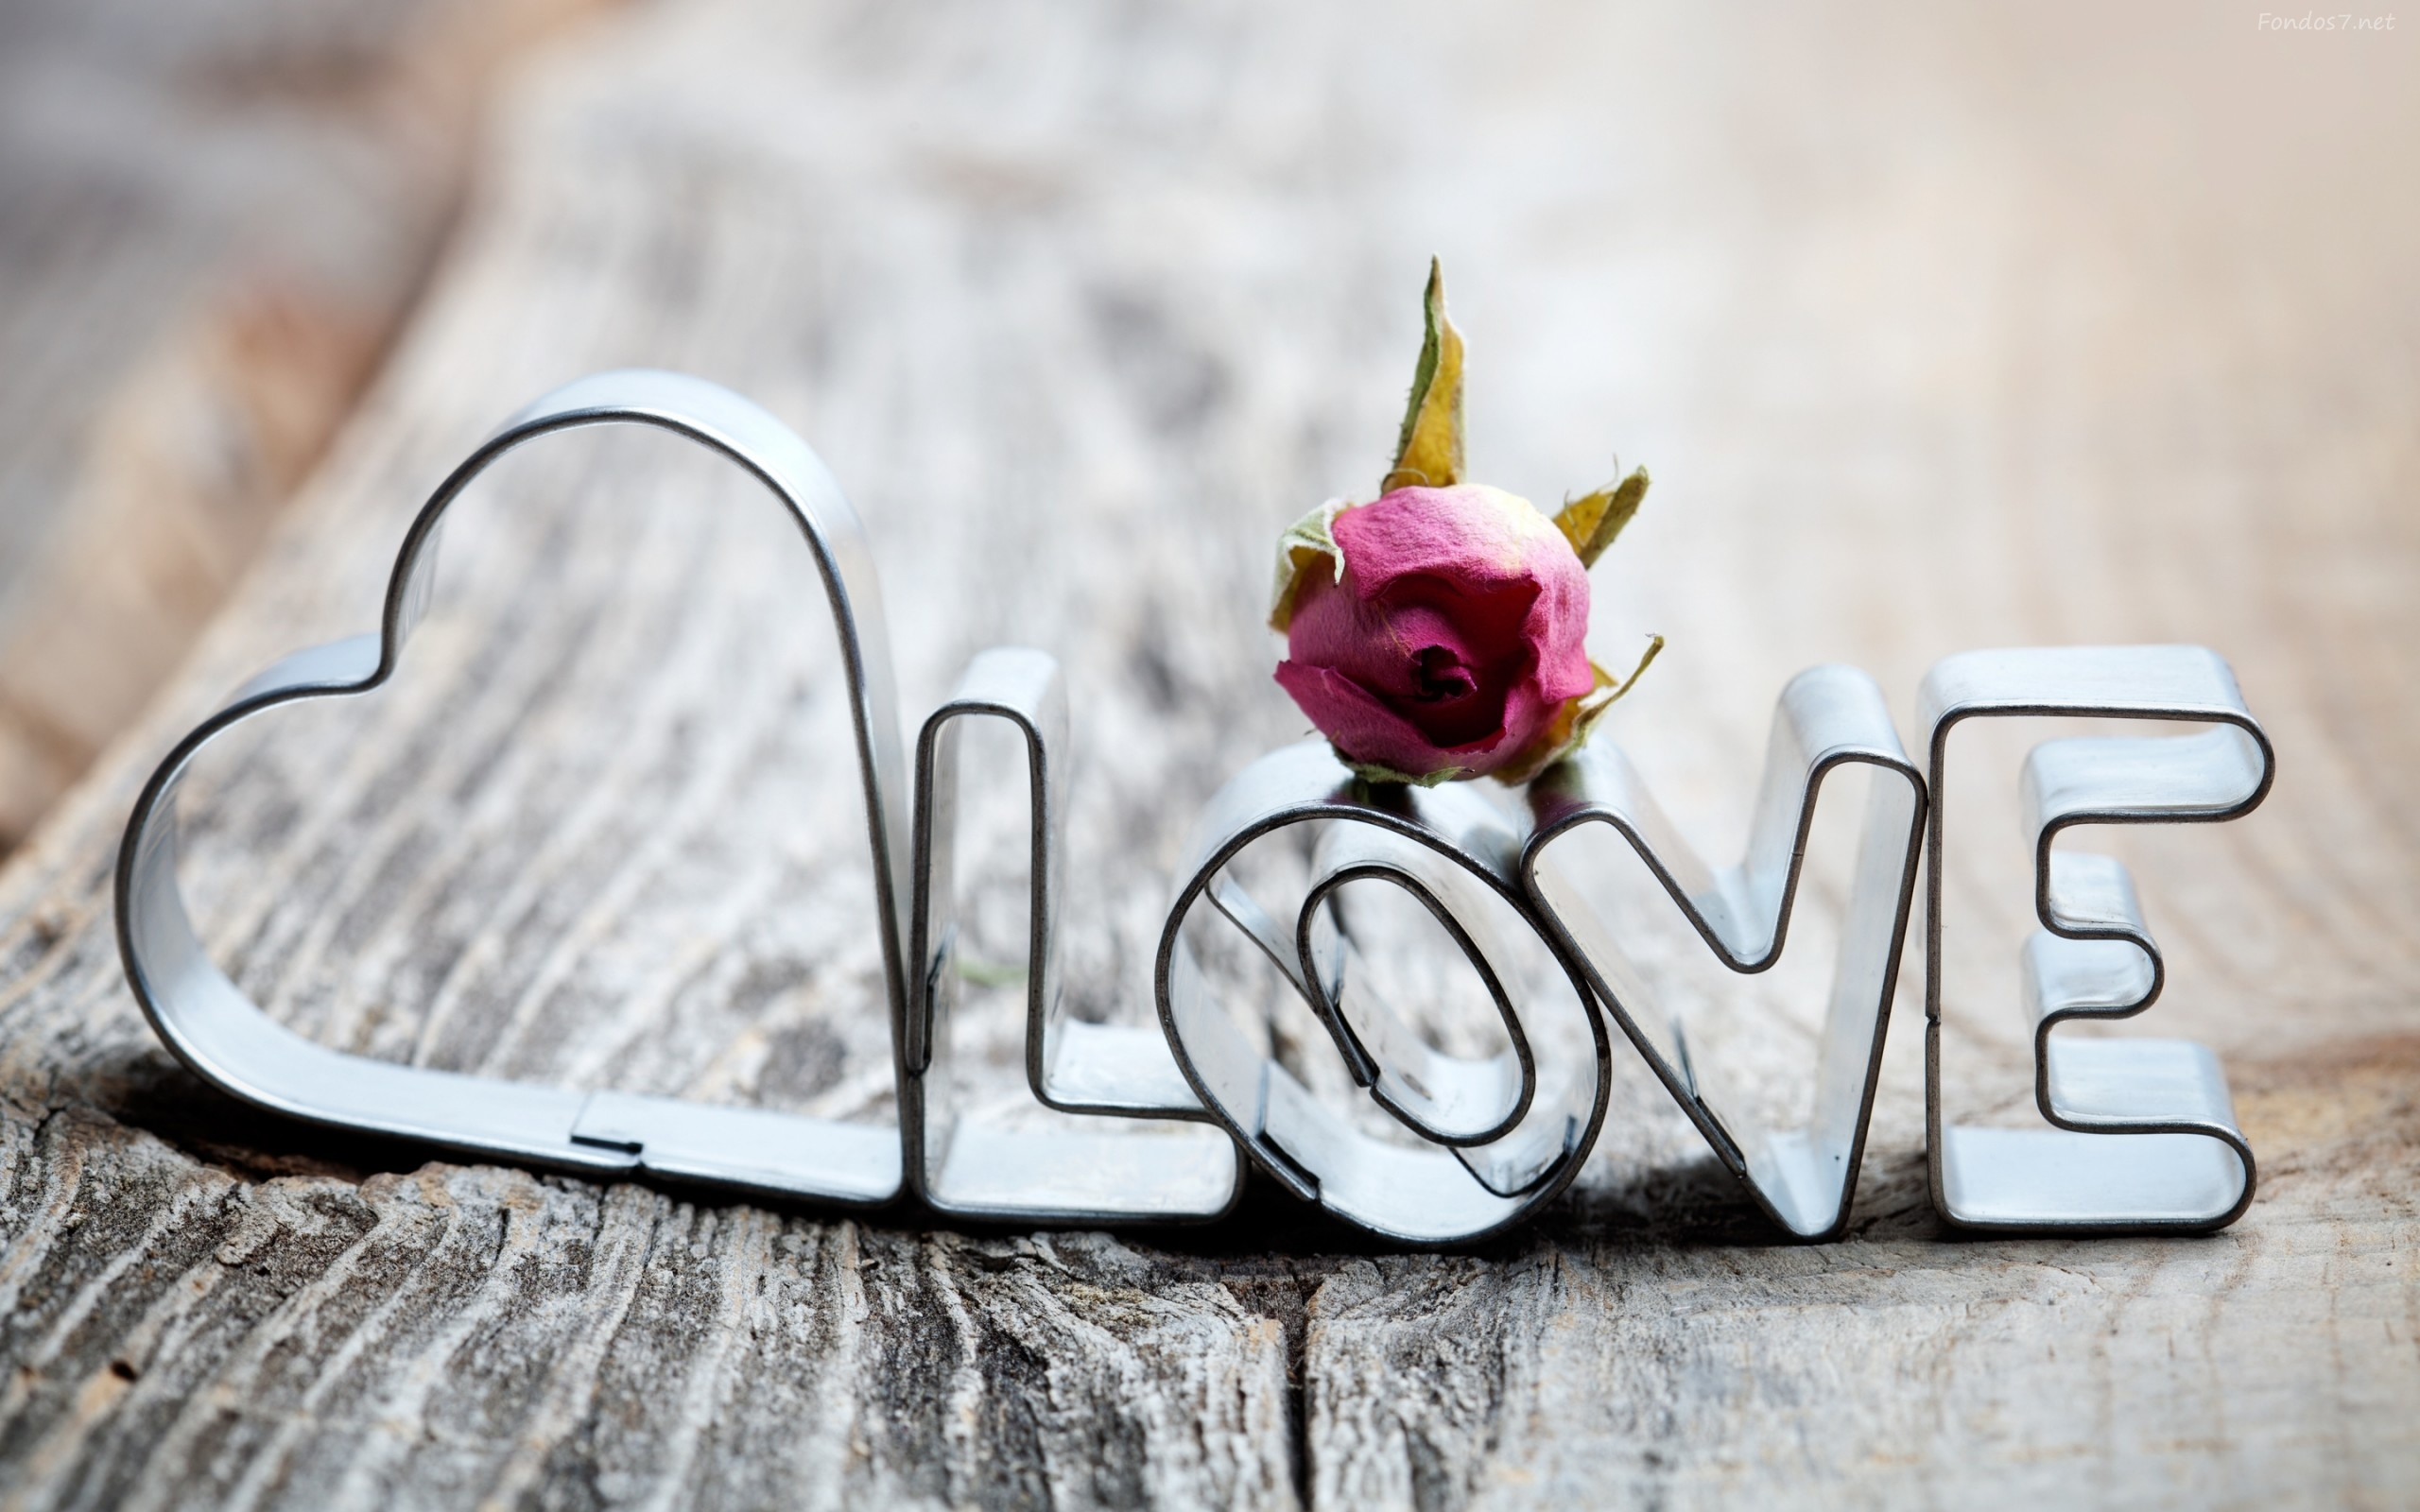 Love wallpapers hd amor fondos de pantalla love 3d for Love the love